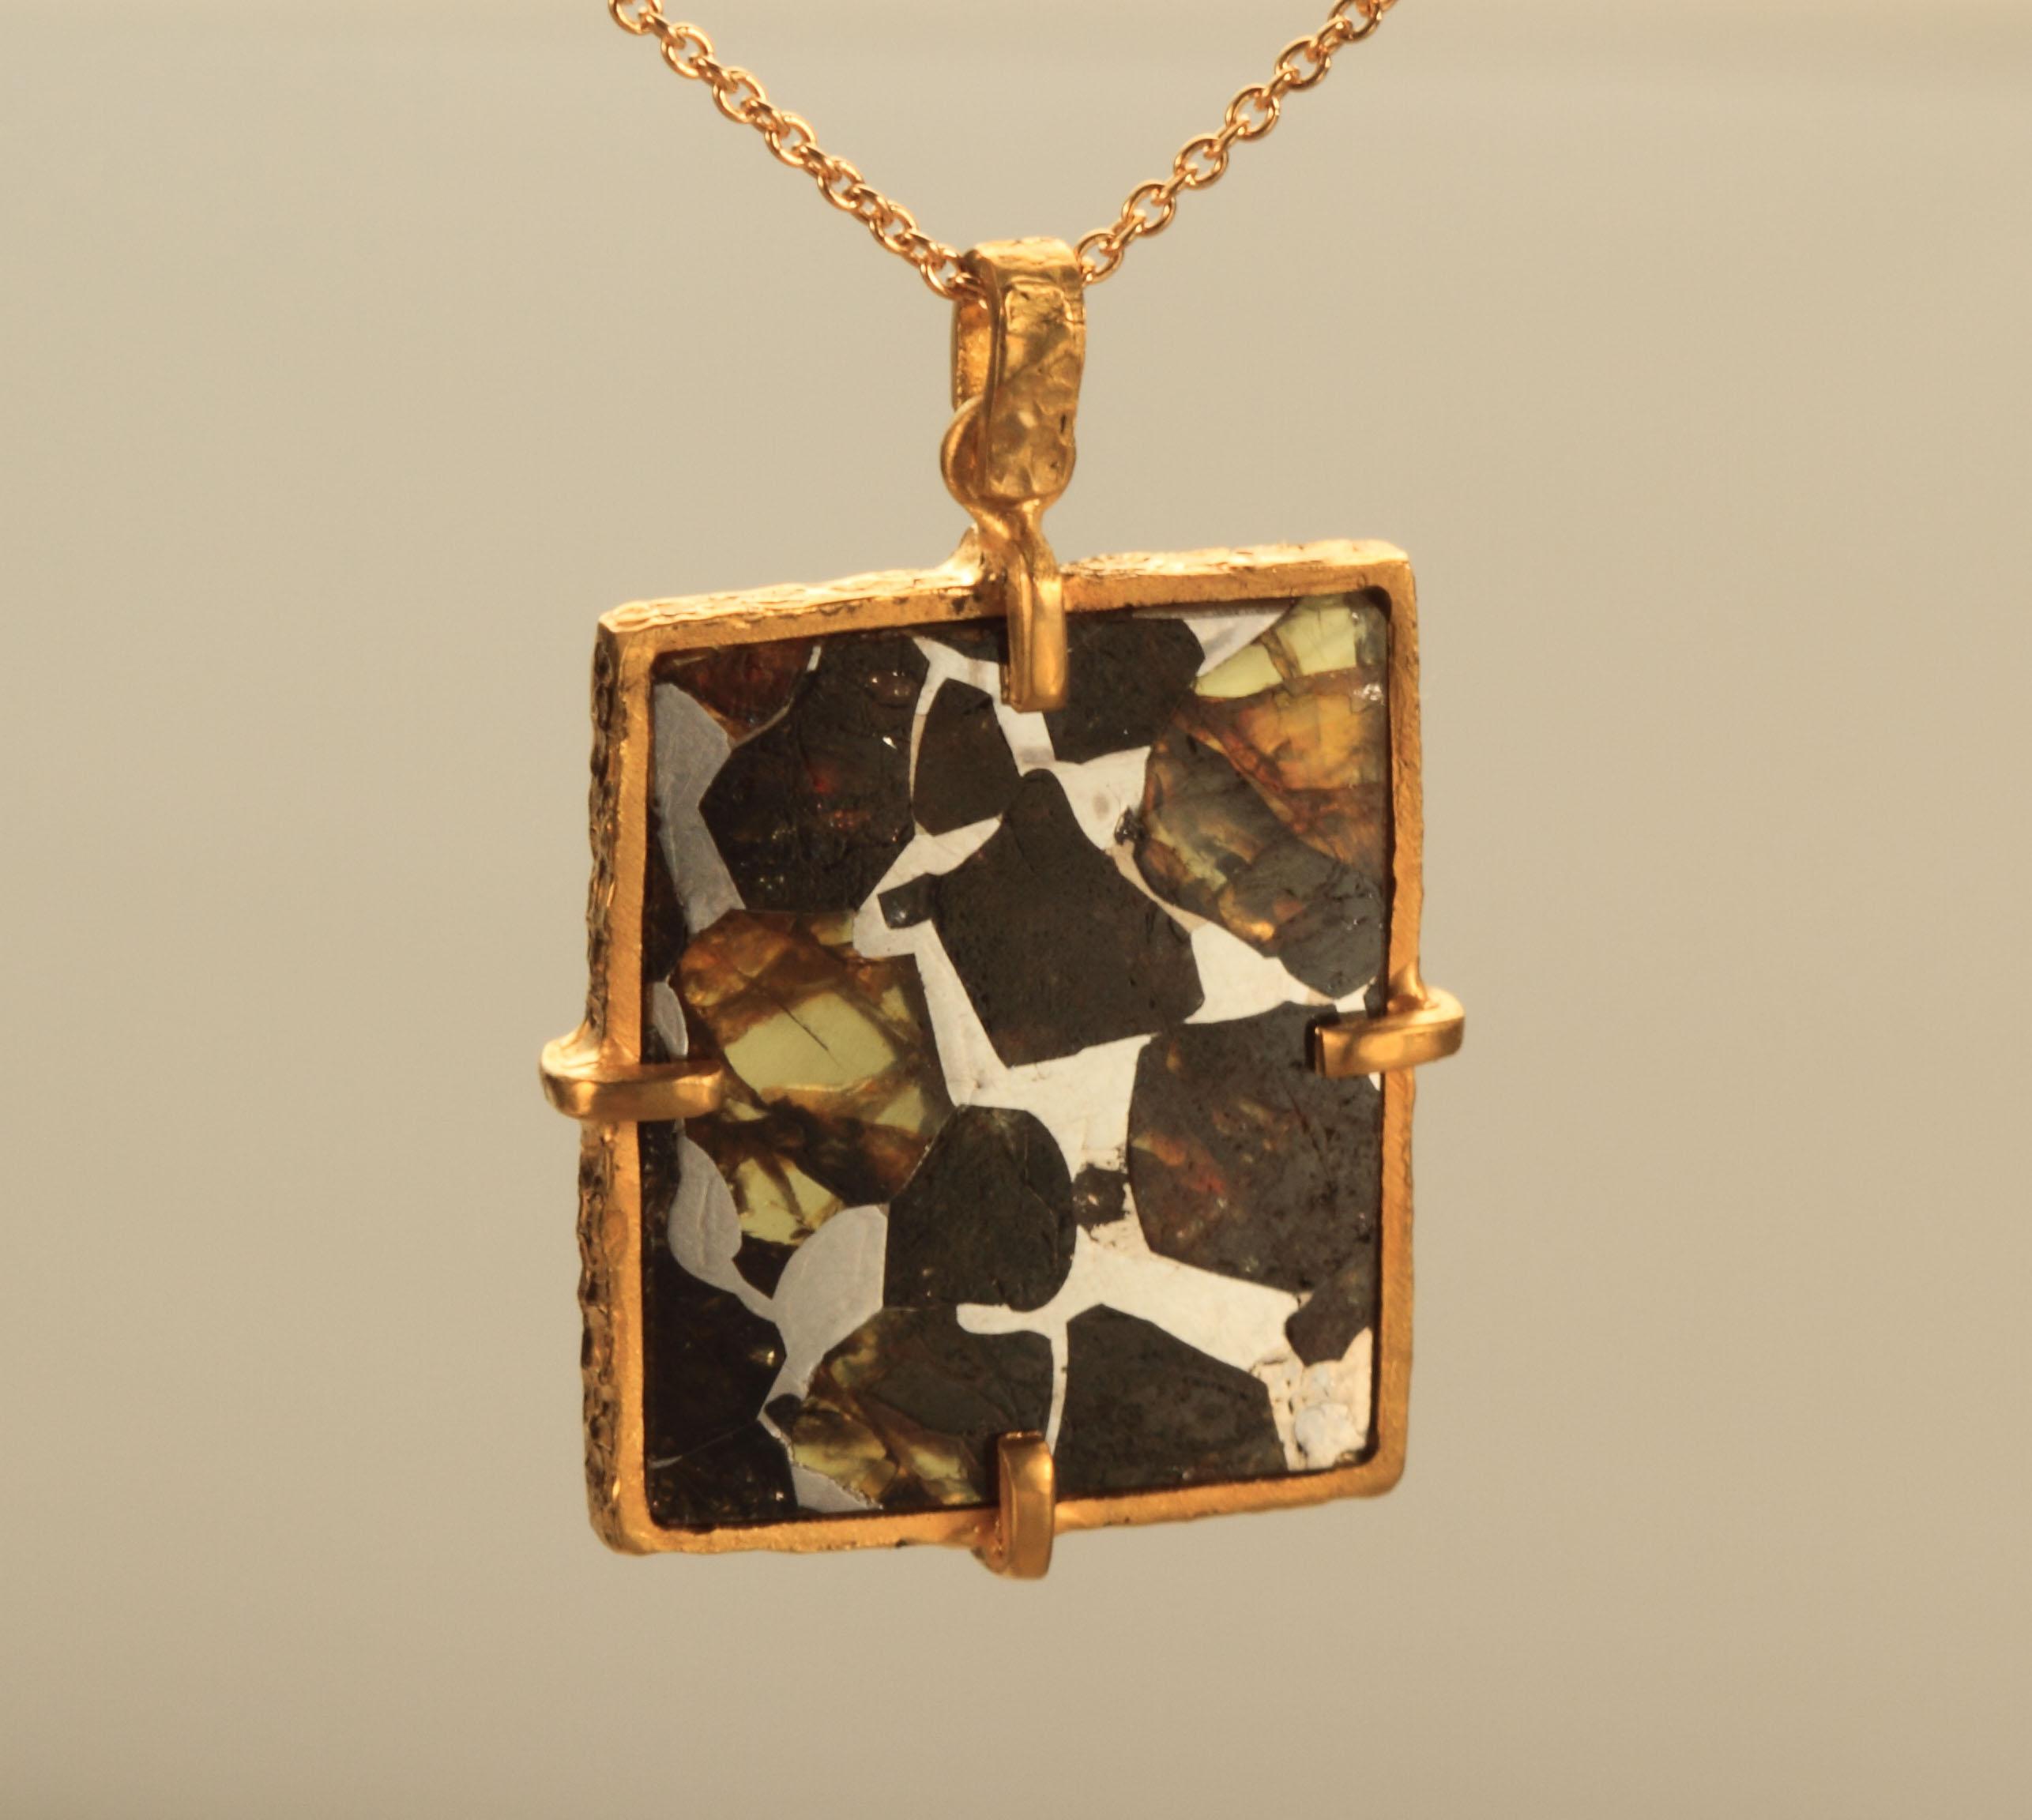 Seymchan pallasite meteorite pendant sedymchan pallasute meteorite pendant not for sale aloadofball Image collections